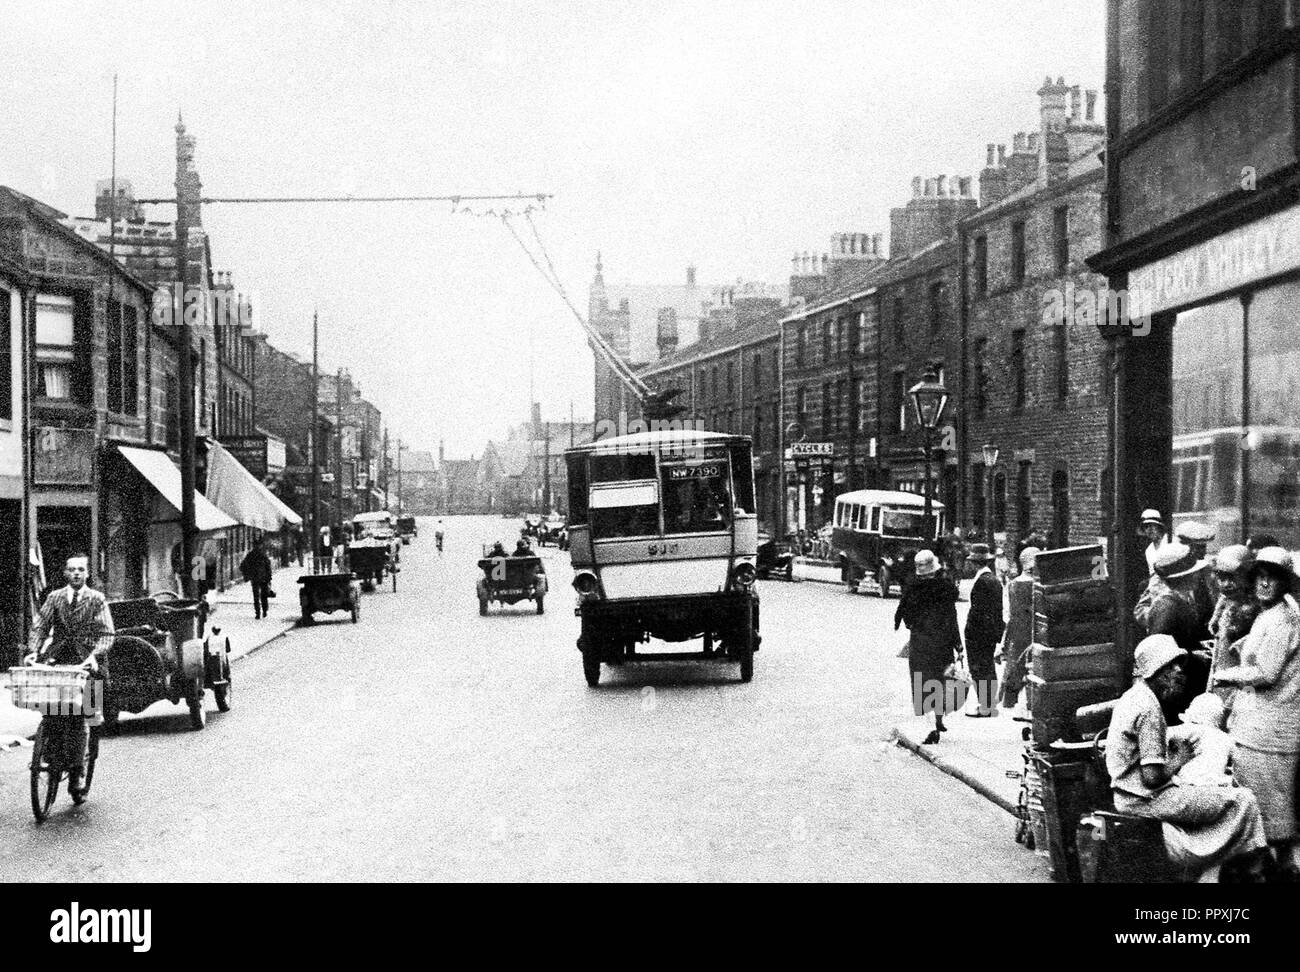 Boroughgate, Otley early 1900's - Stock Image